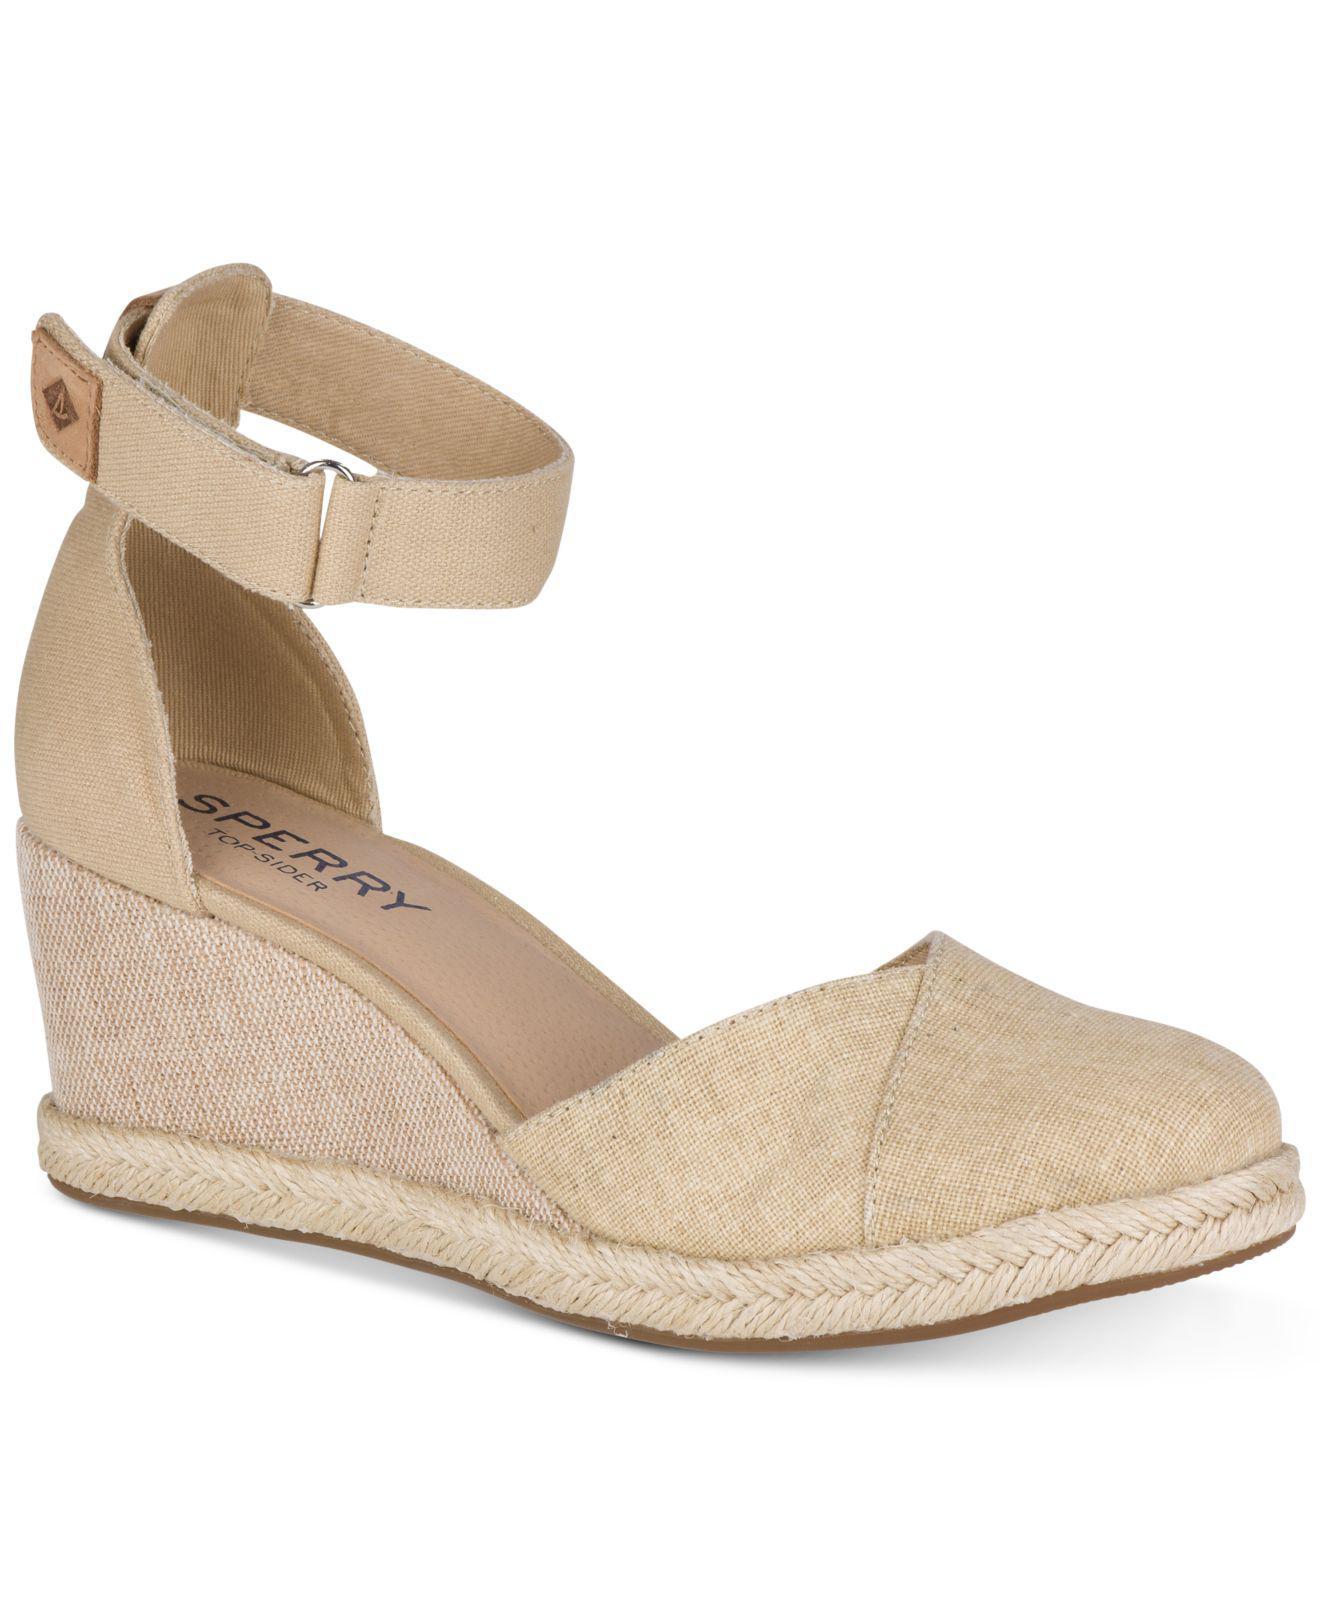 Sperry Women's Valencia Platform Espadrille Wedge Sandals Women's Shoes hHPVC